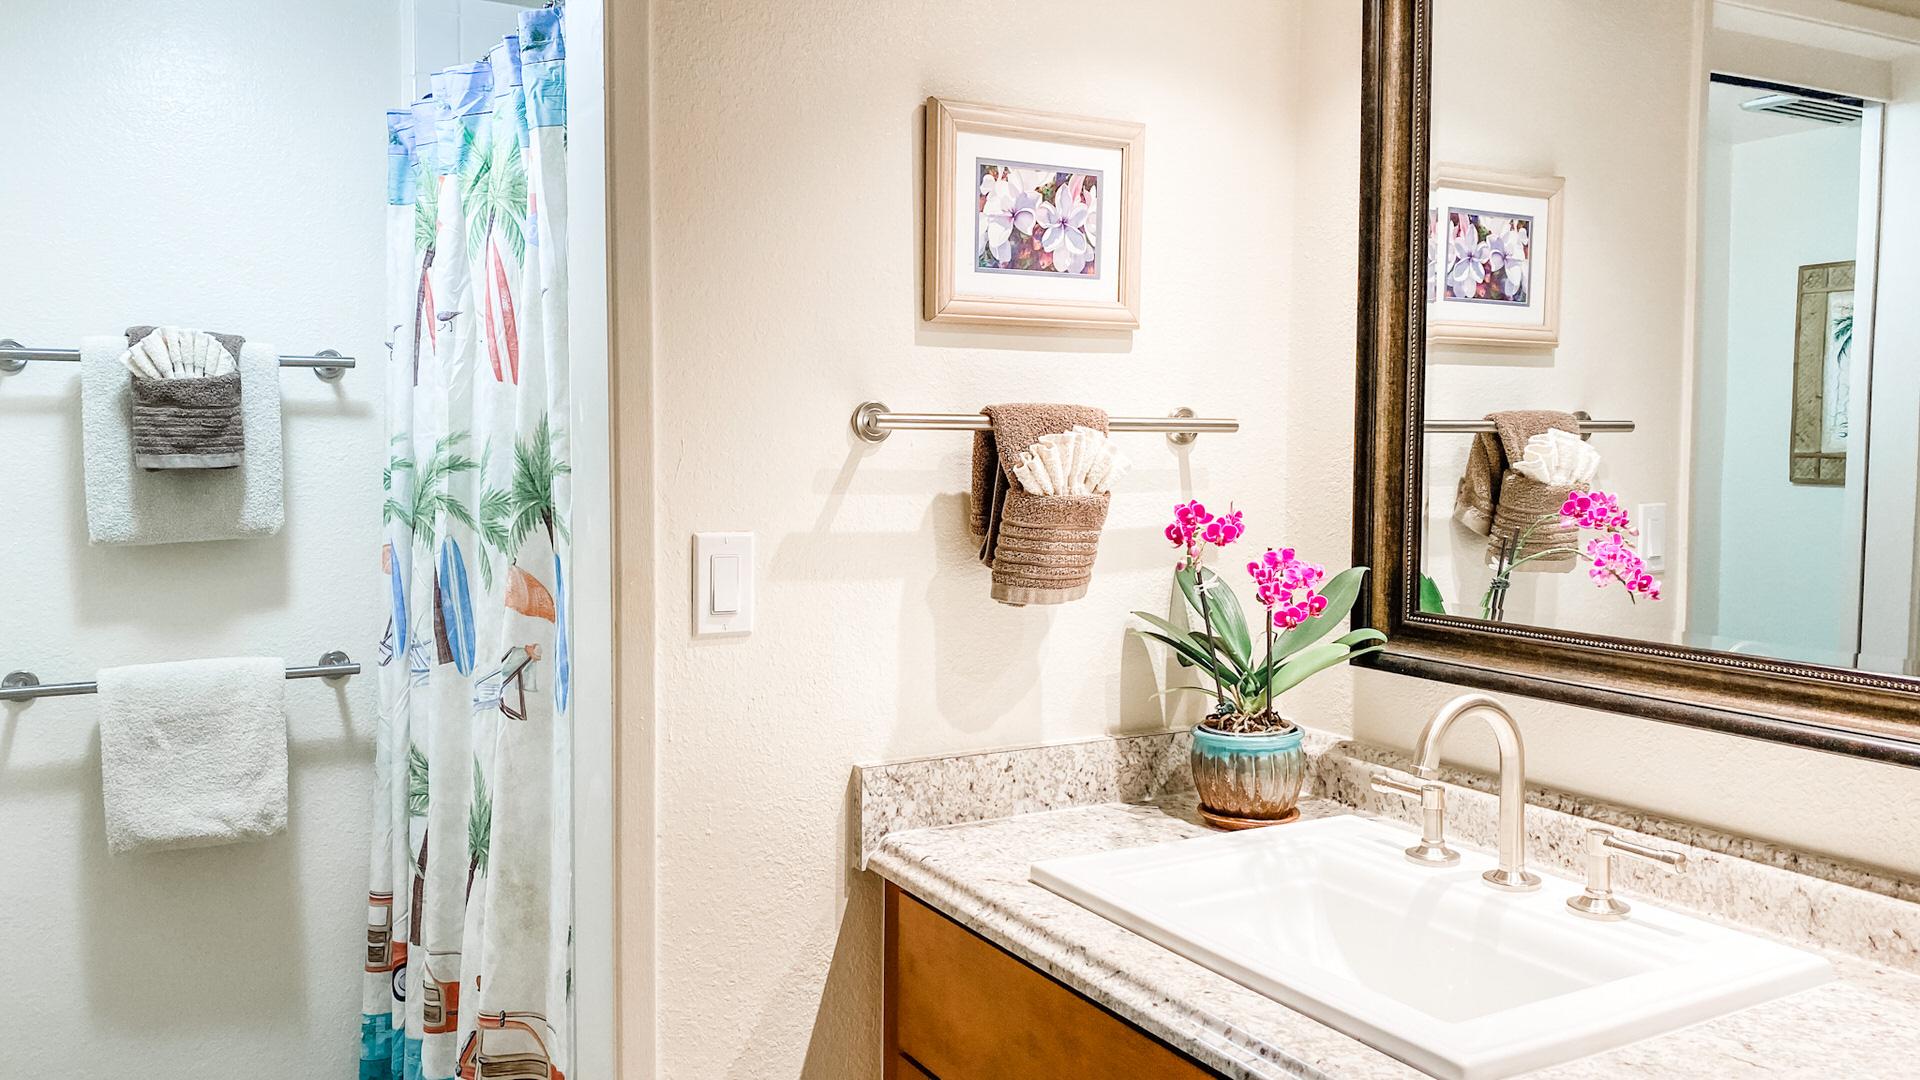 B311 Bathroom and Vanity